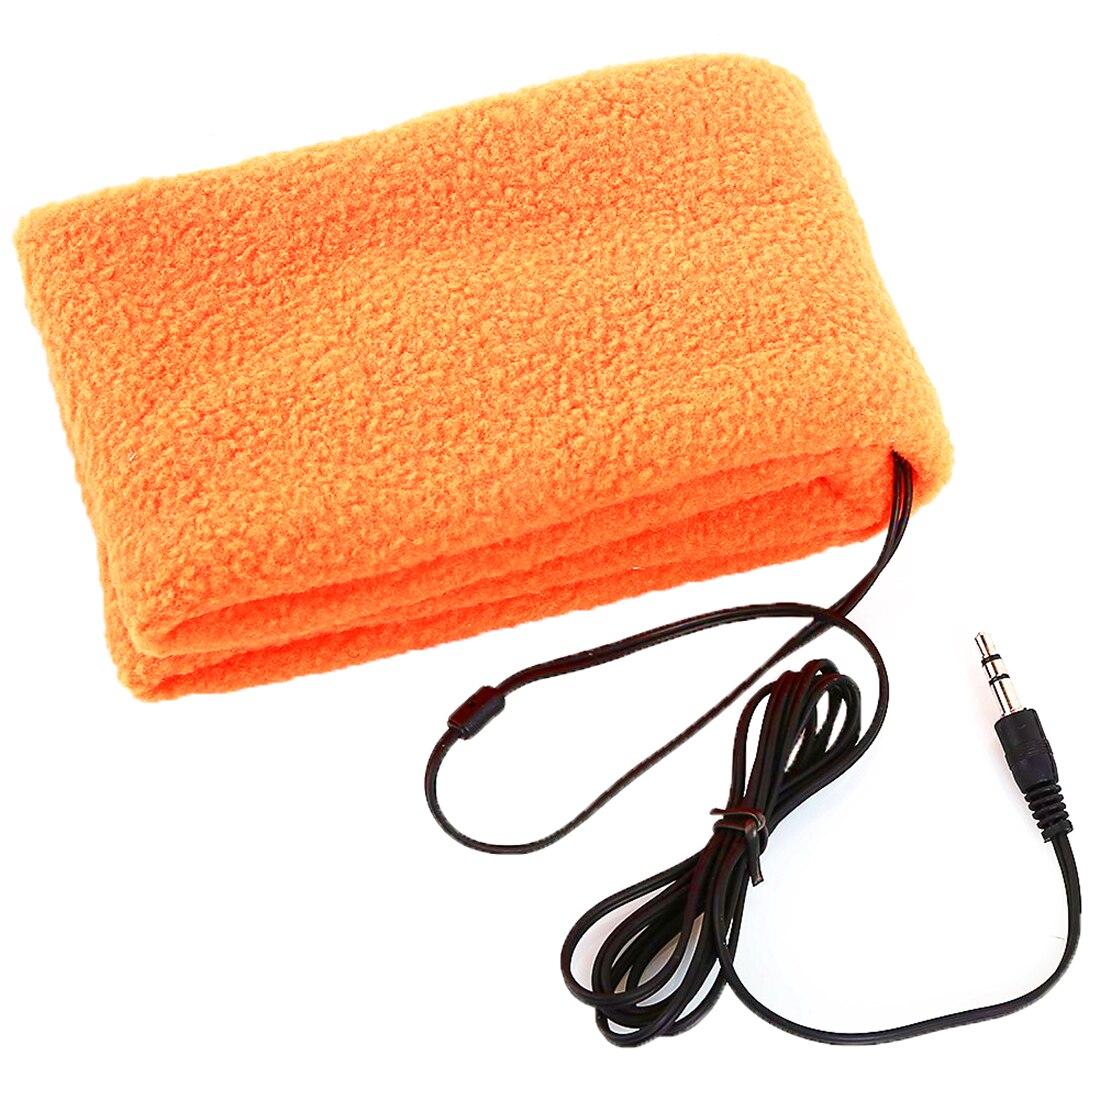 MAHA Novelty Soft Comfortable Sleeping Headphones Sports Headband Headphones Earphones Headset (Orange)<br><br>Aliexpress